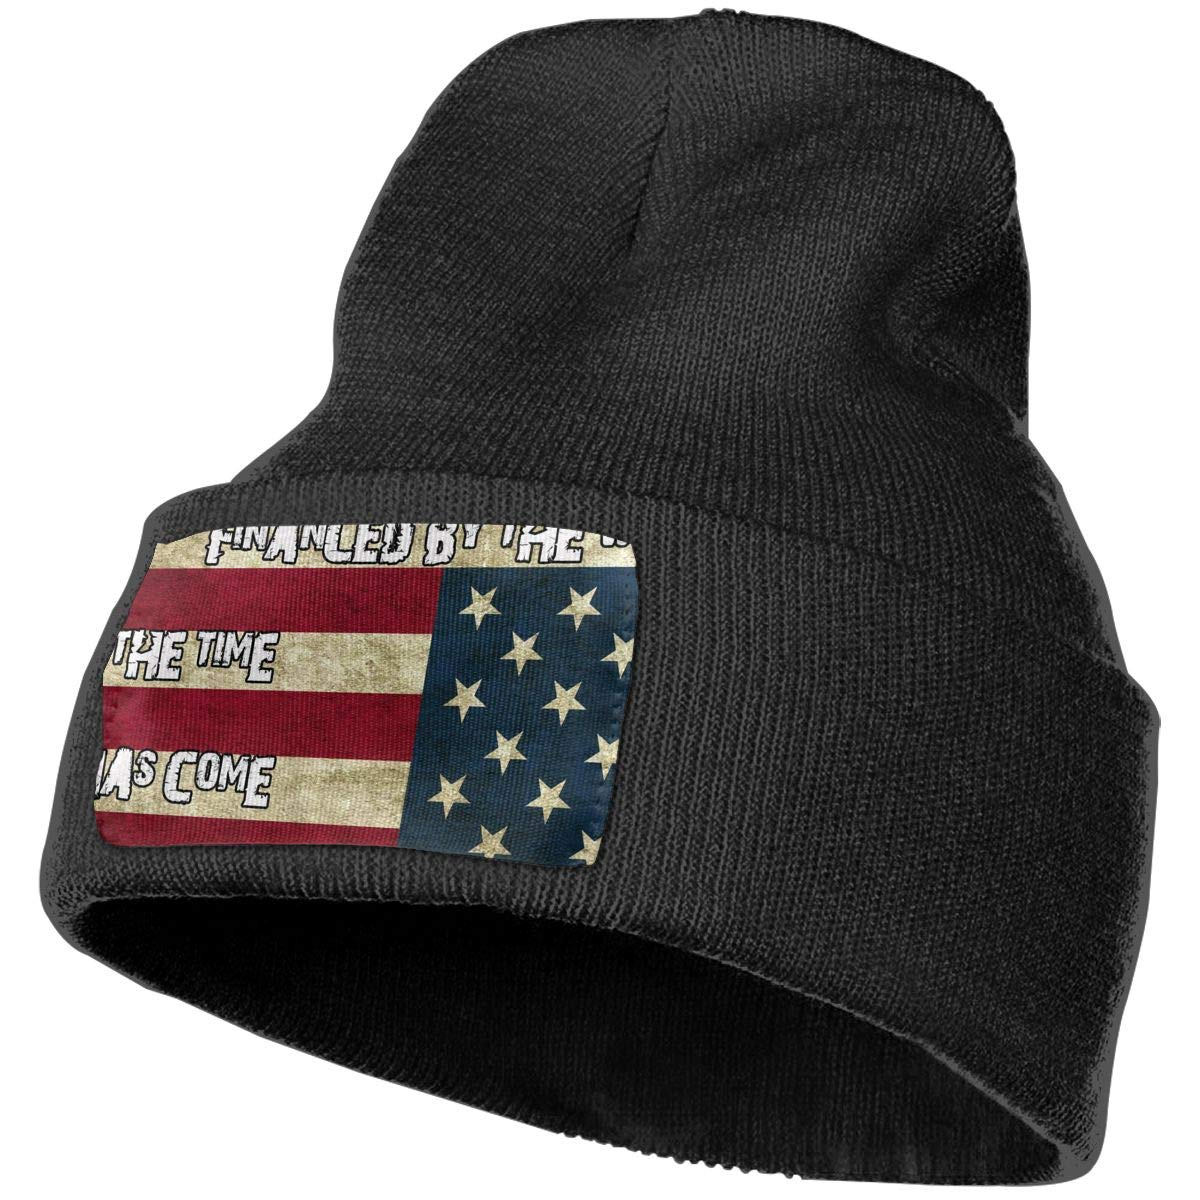 Horizon-t American Flag Unisex 100/% Acrylic Knitting Hat Cap Fashion Beanie Hat